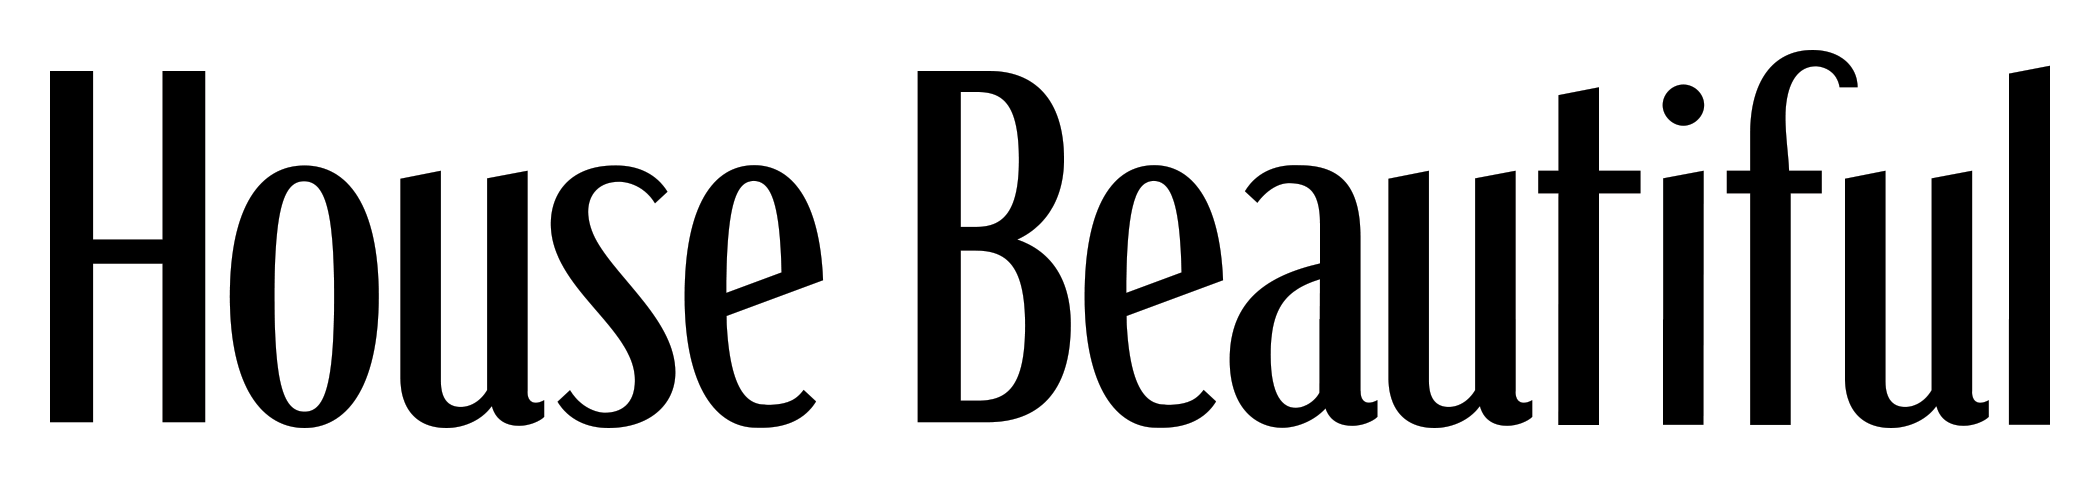 house_beautiful_2019_logo.png